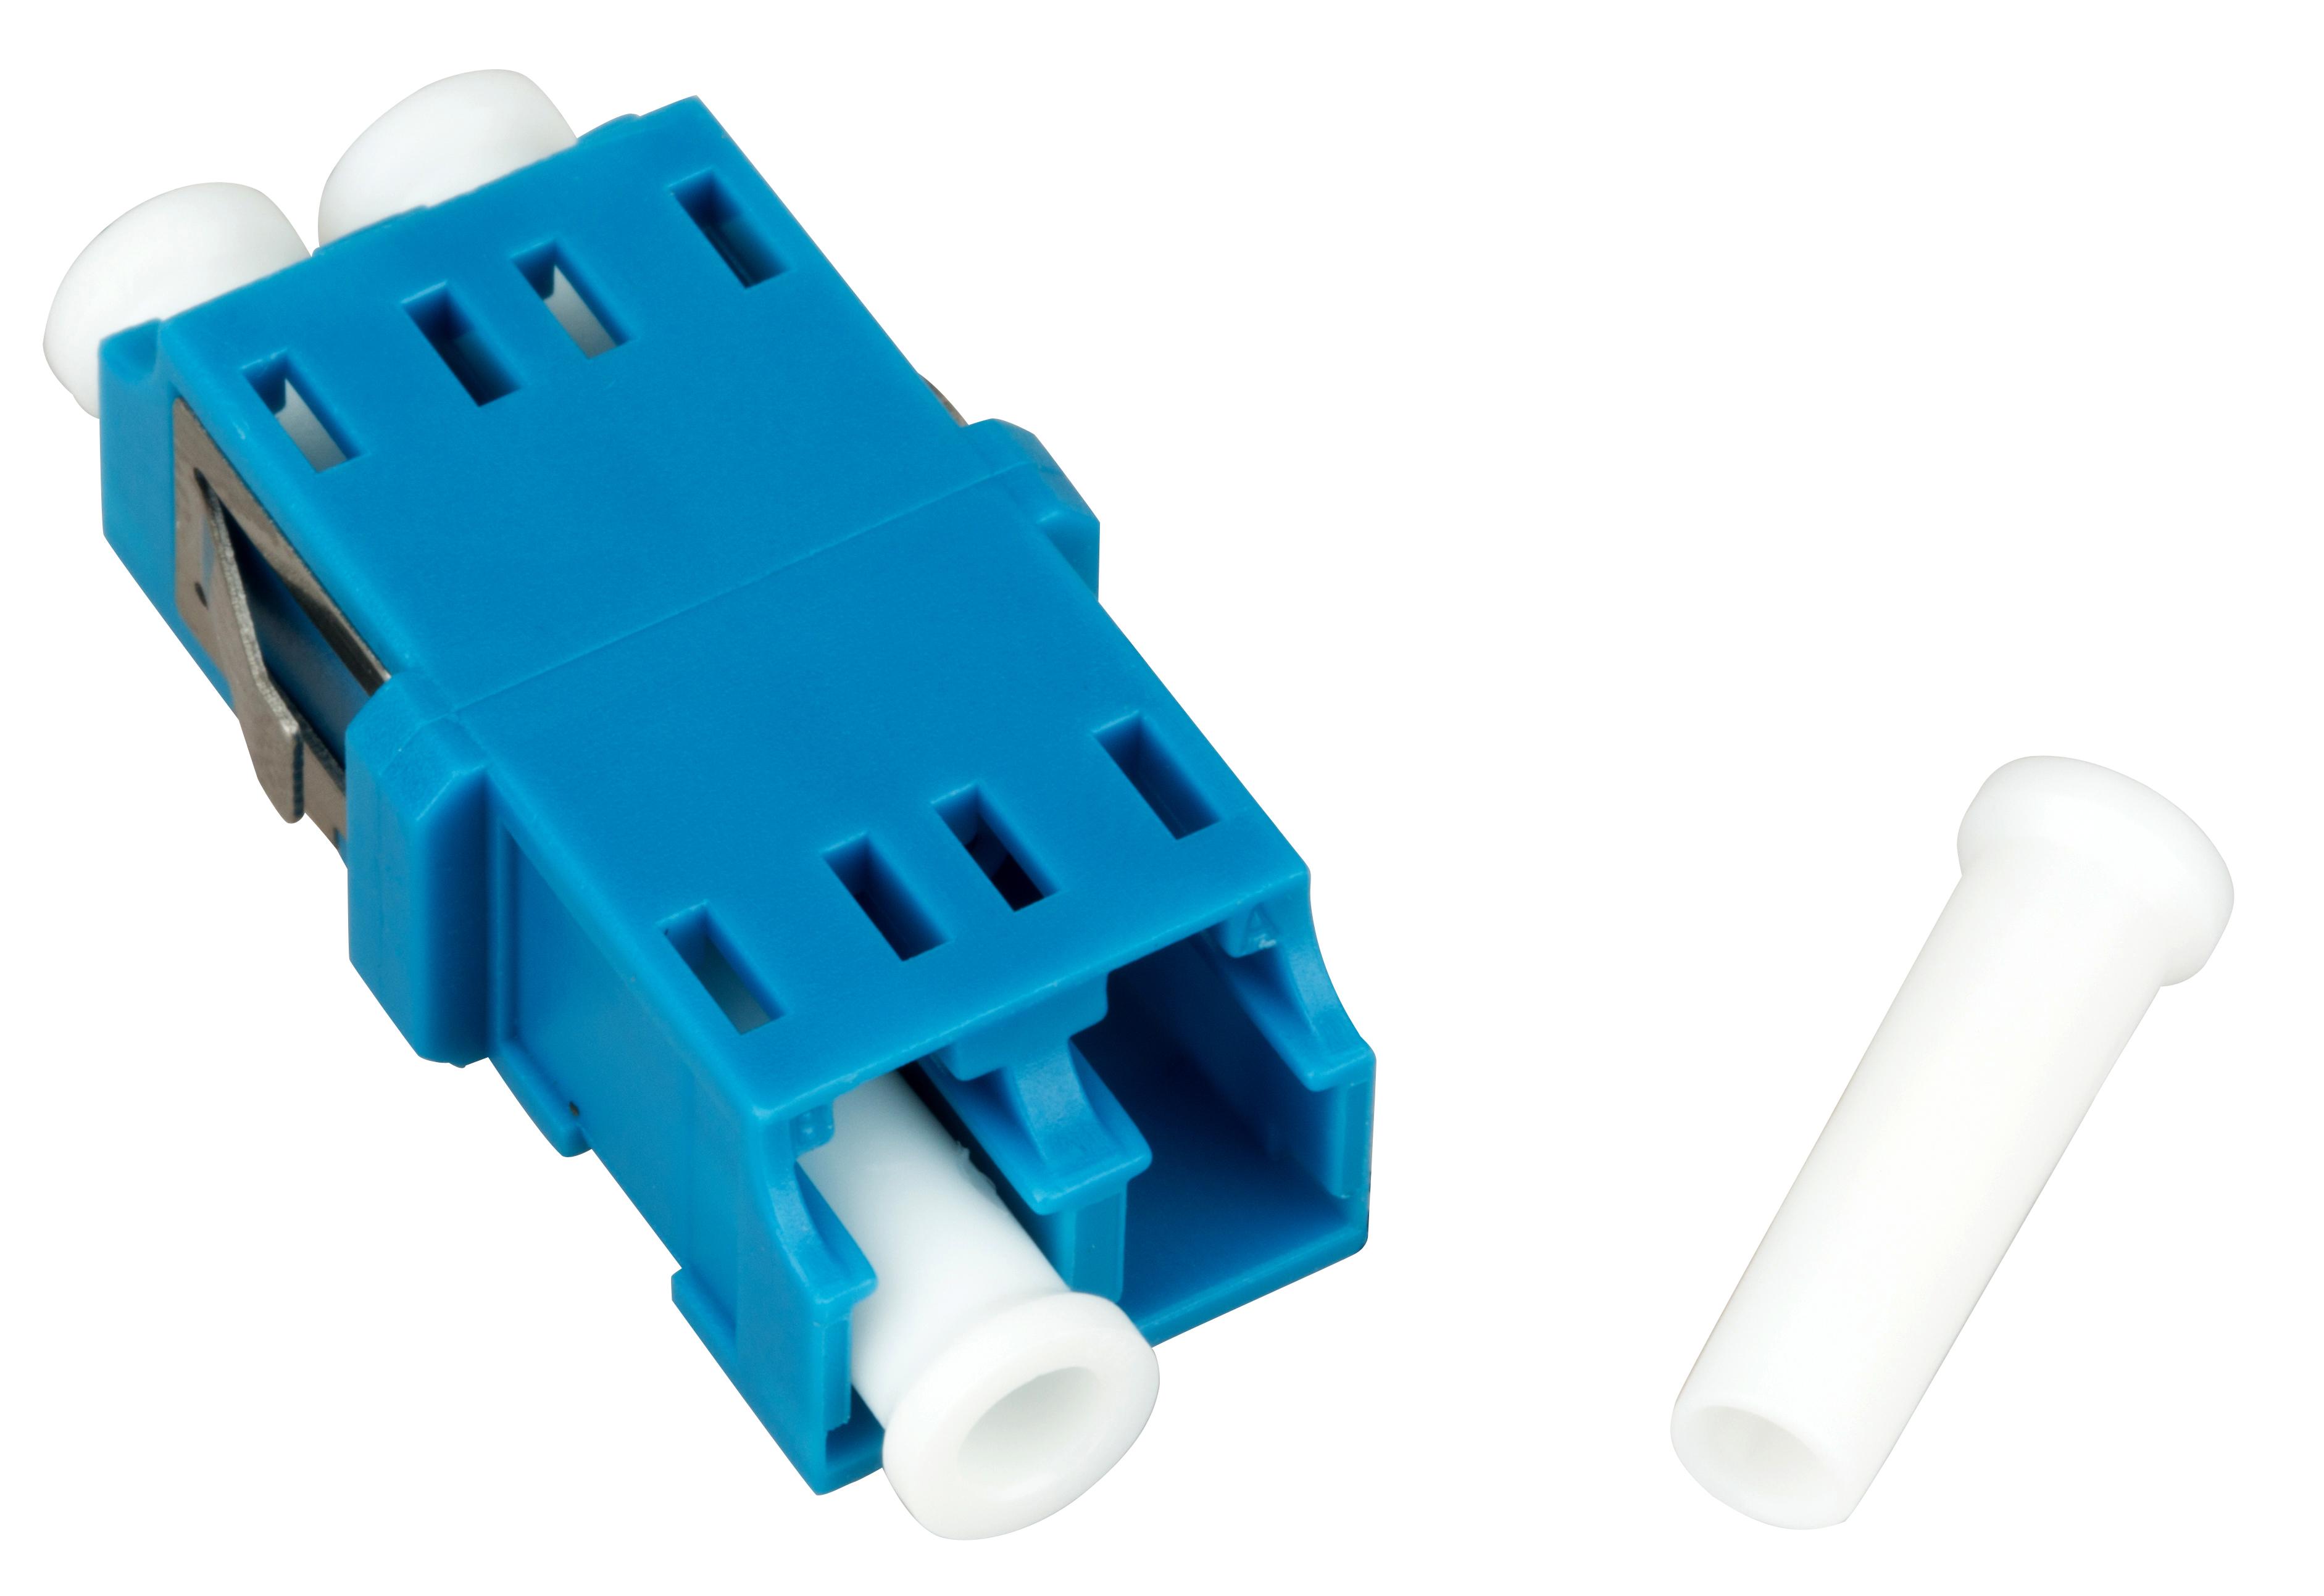 1 Stk LWL Kupplung LC-Duplex, Singlemode. zirc, ohne Flansch, blau HMOLE00104